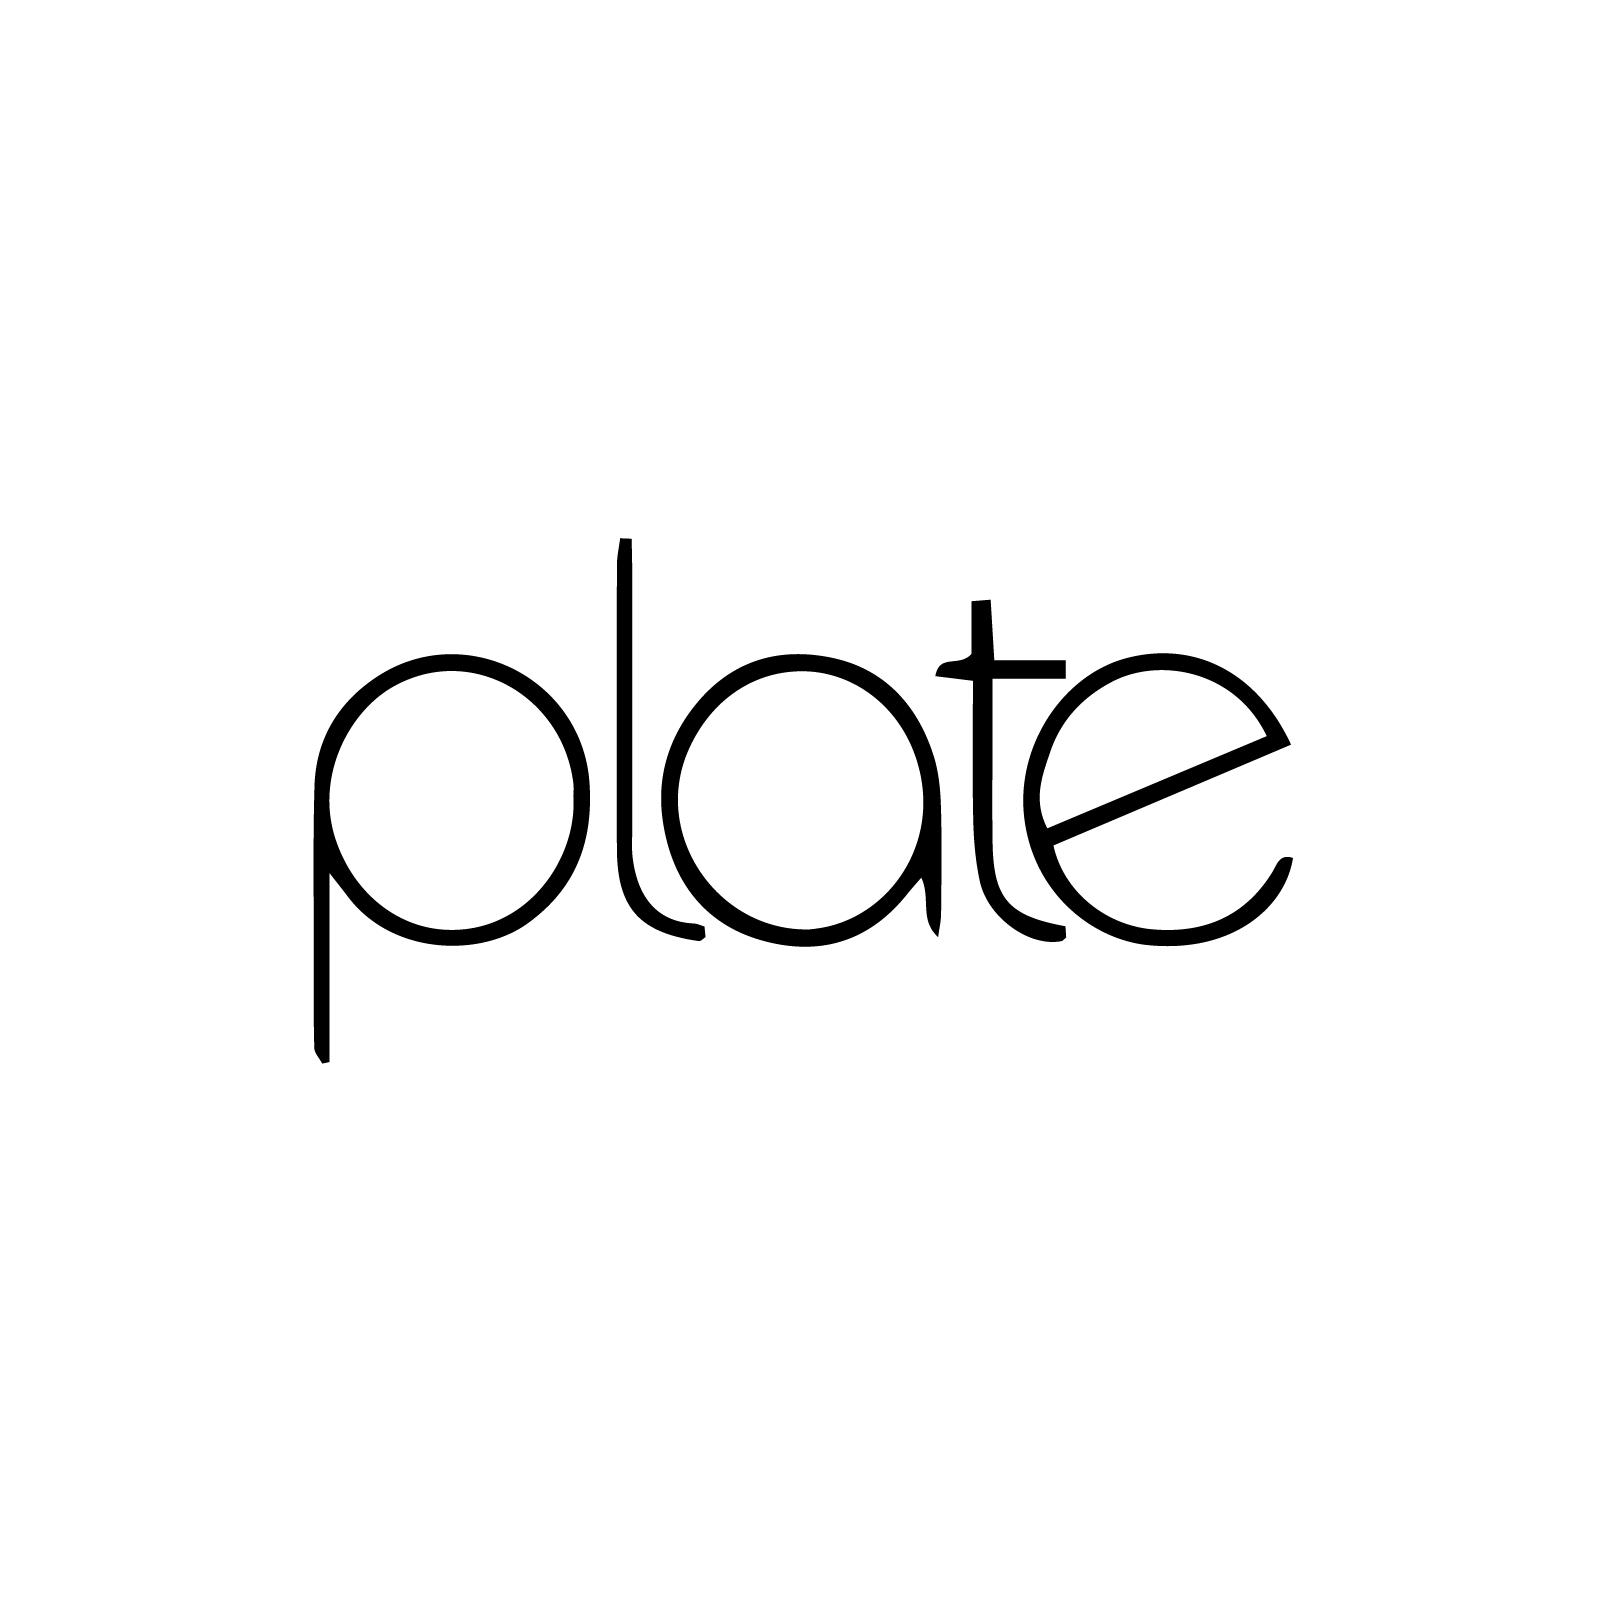 Press Logos_Plate.png